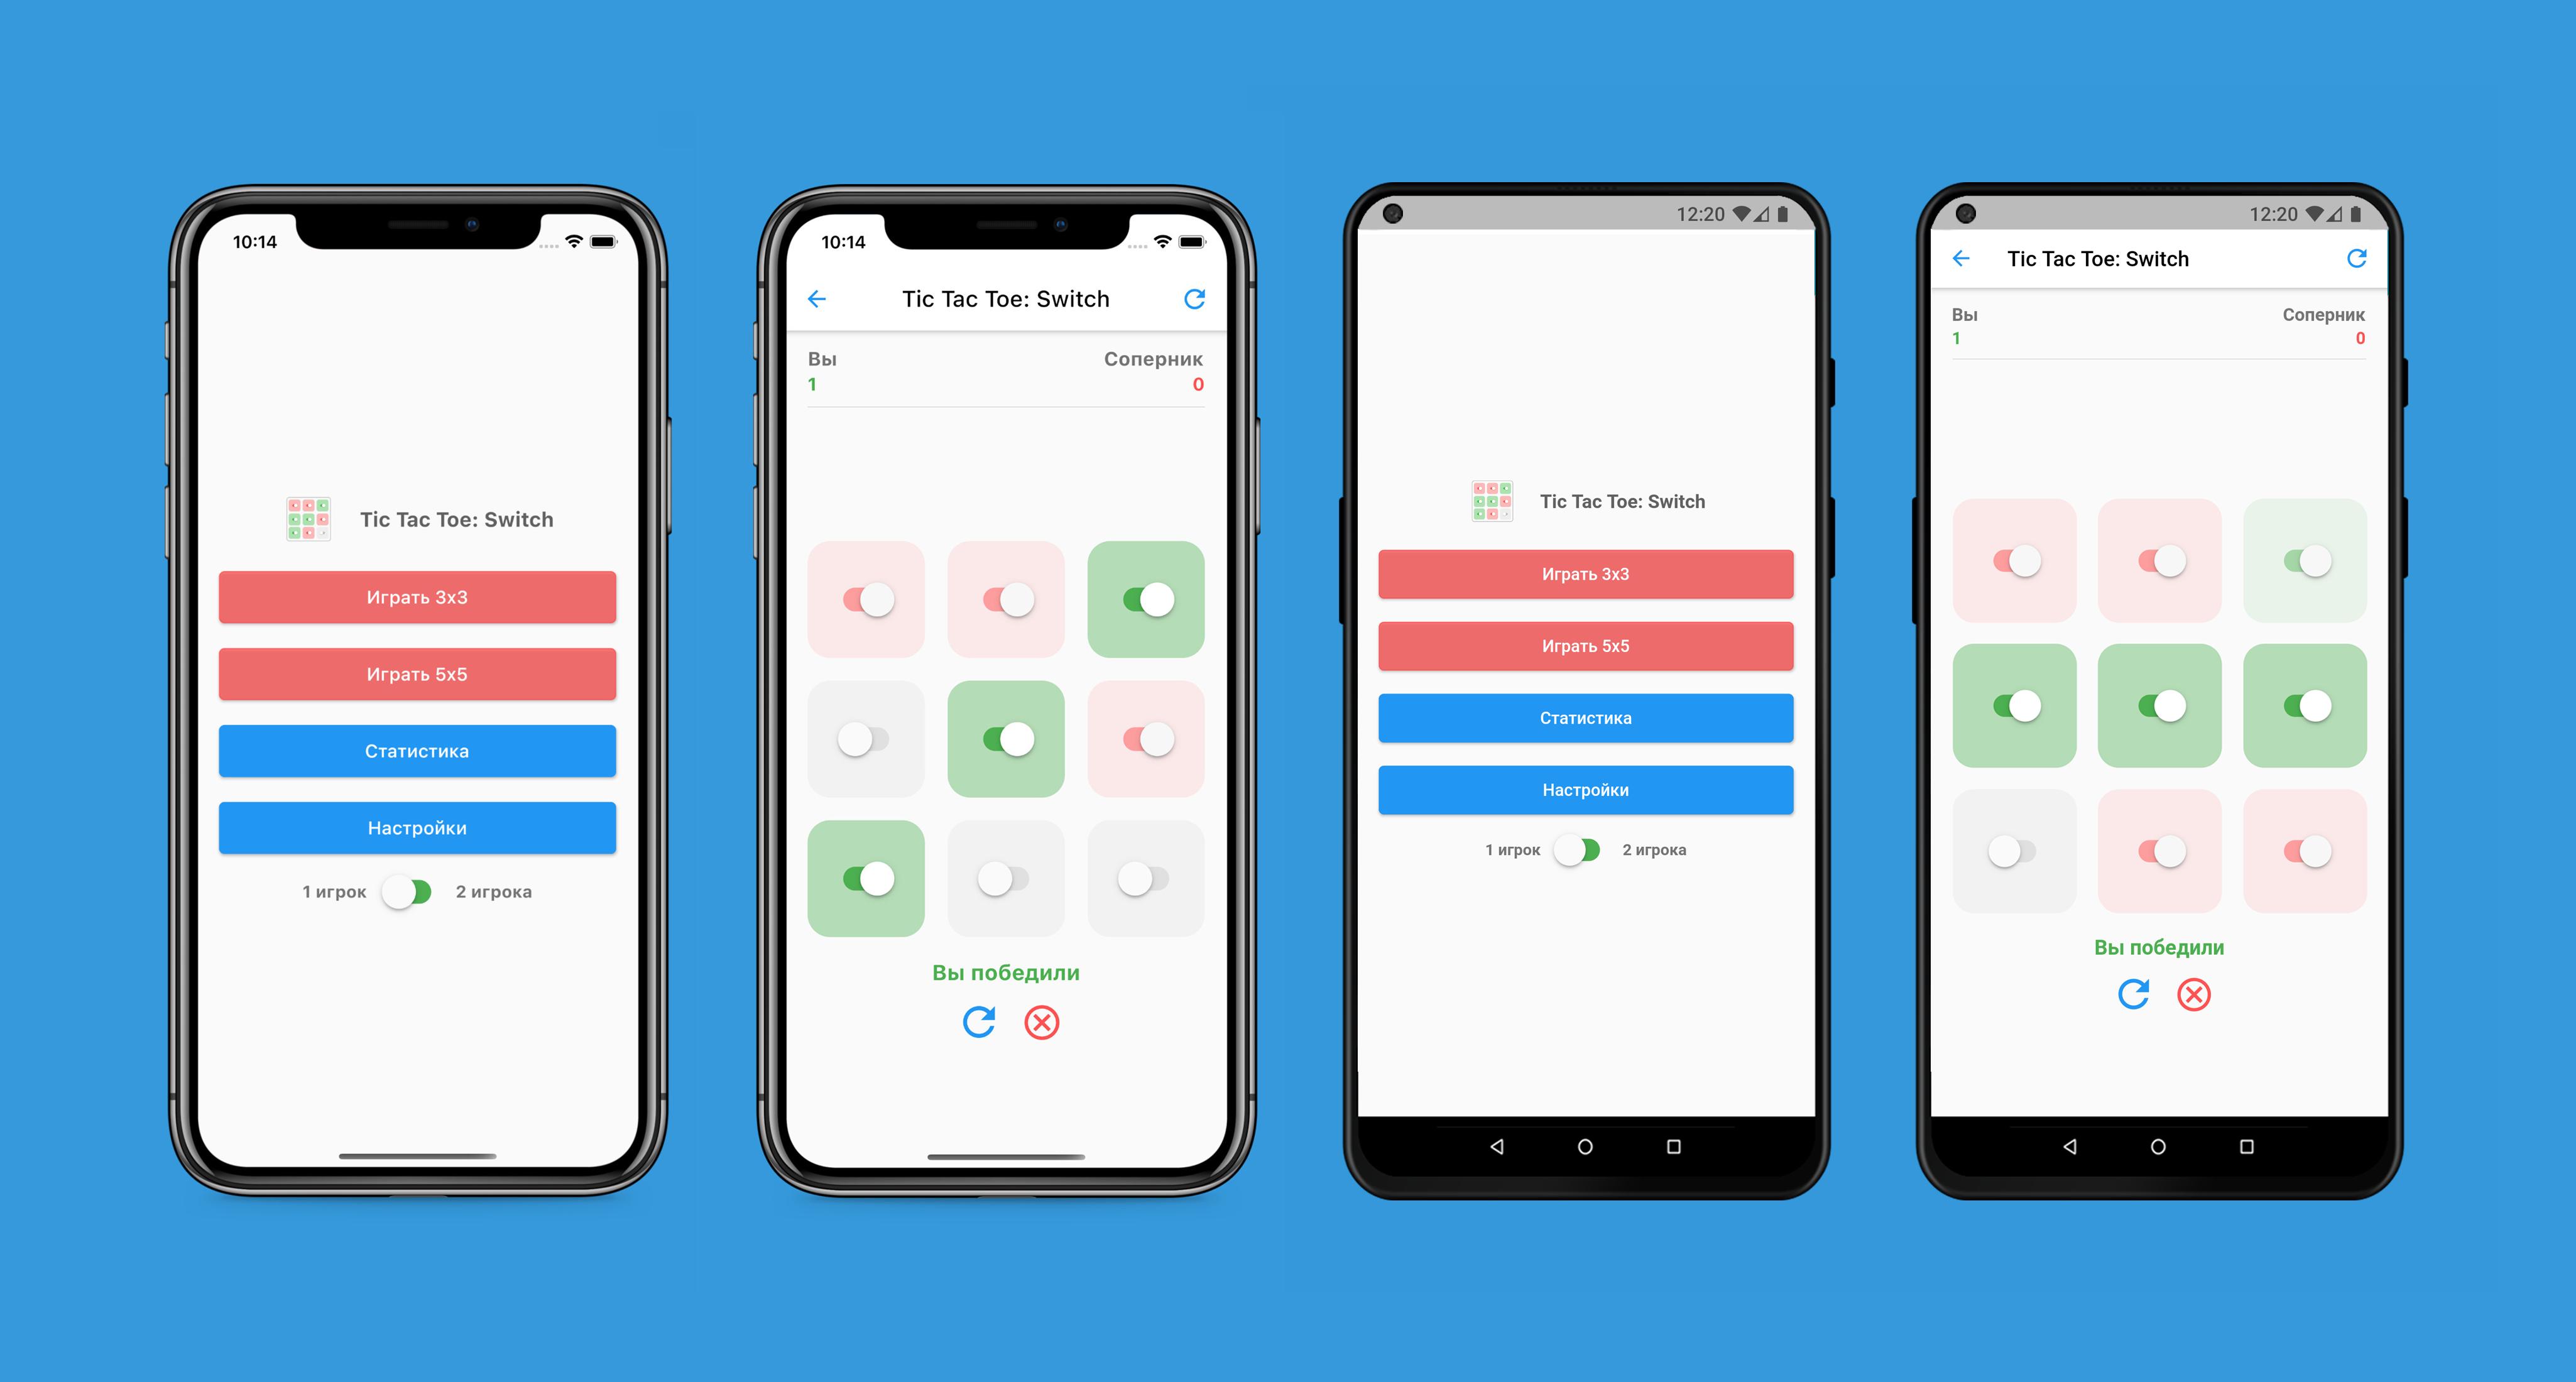 Игра Tic Tac Toe: Switch на Flutter (iOS / Android) купить